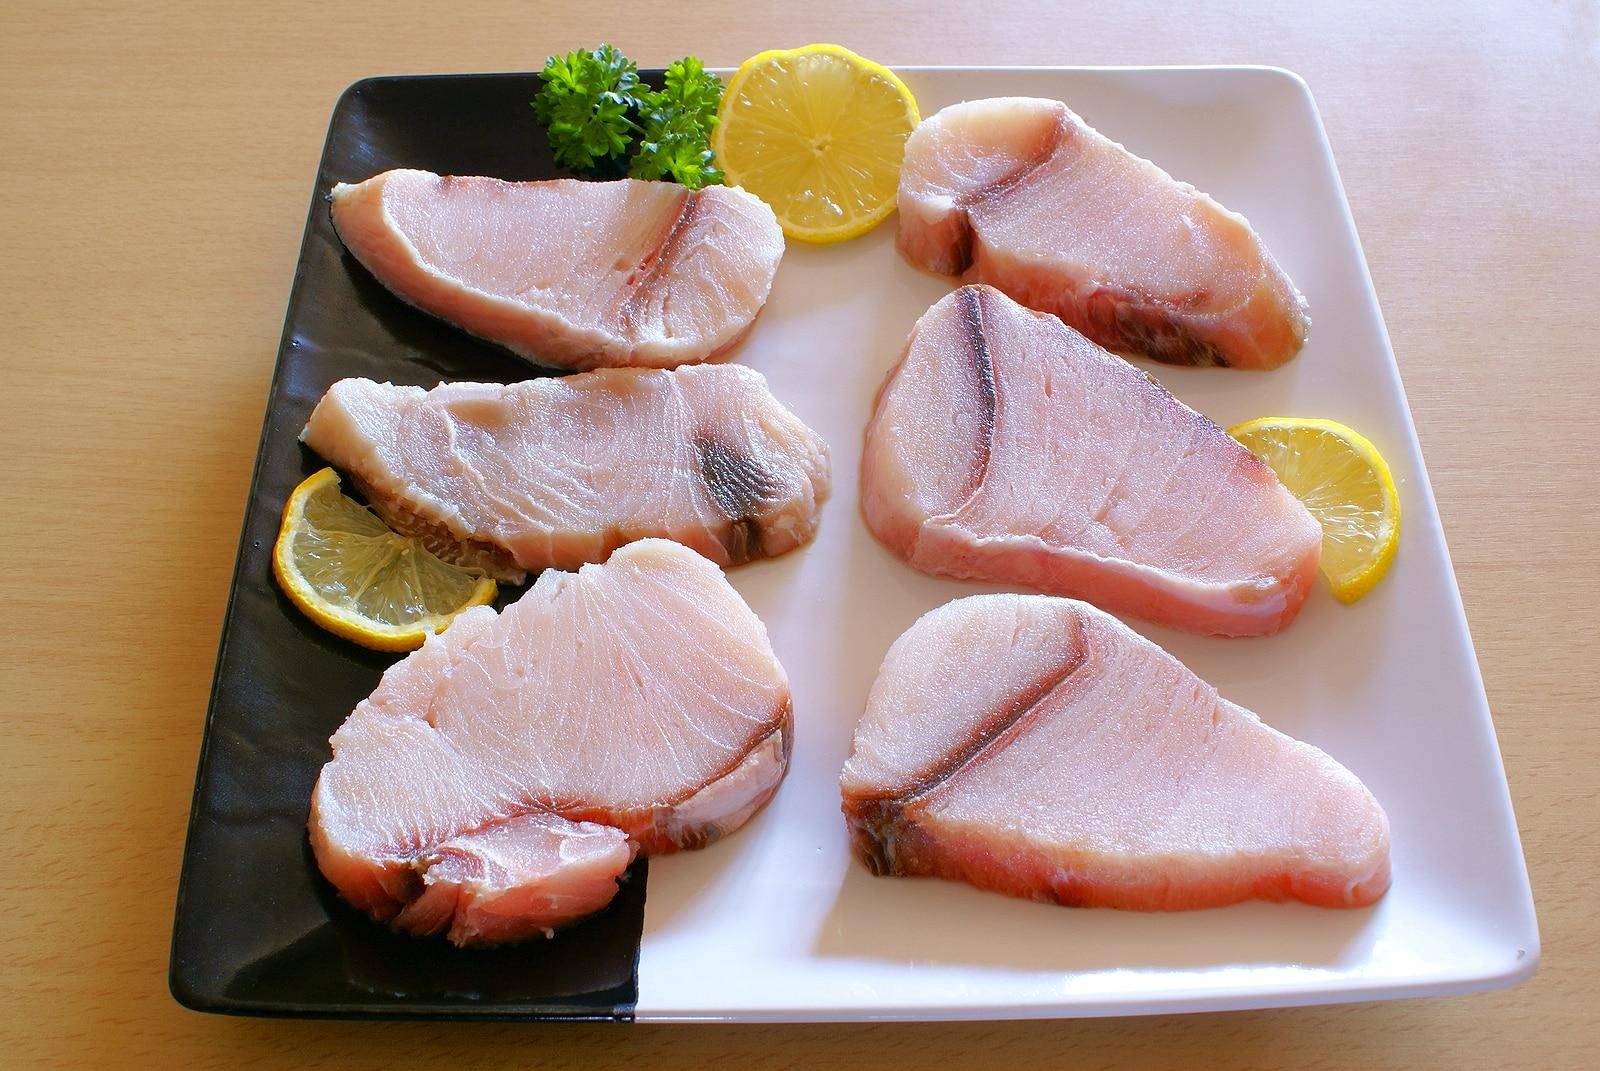 Raw shark fillets. shark meat